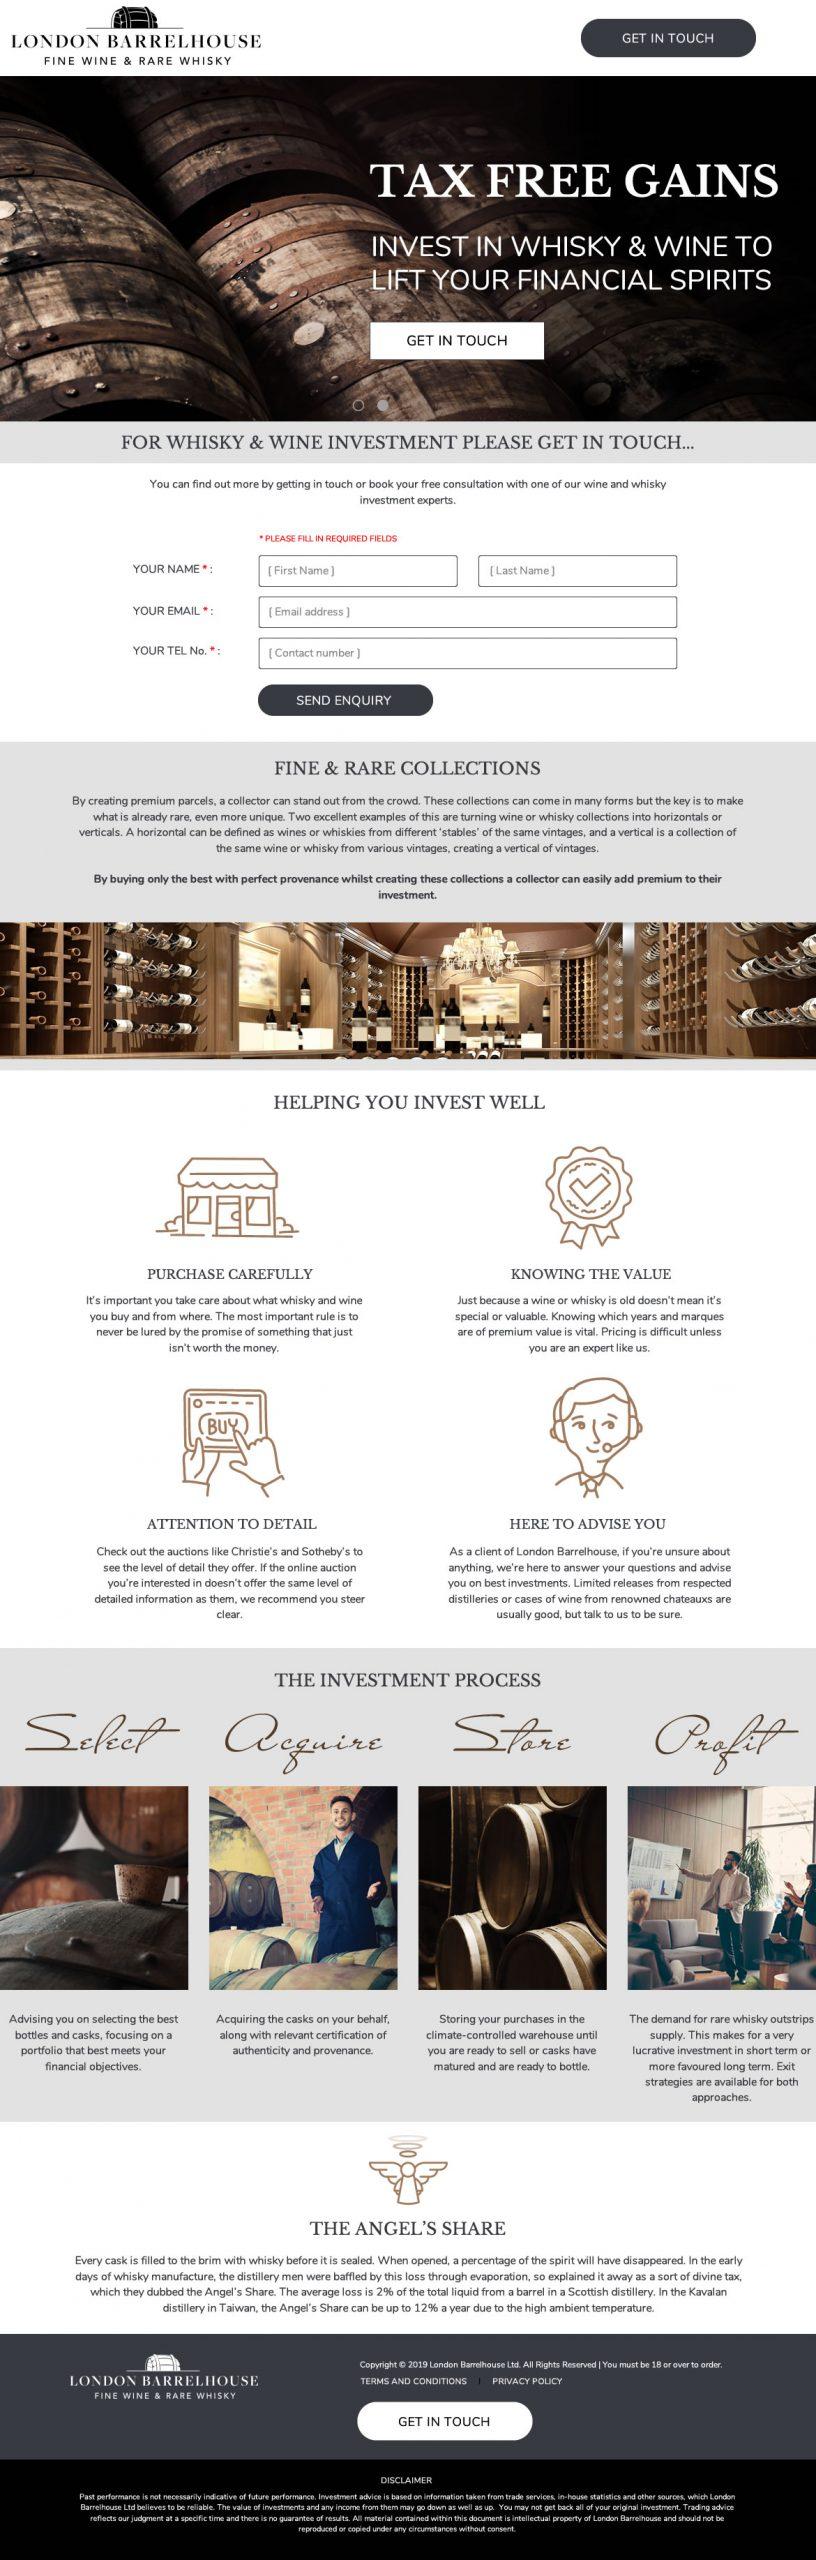 London Barrel House website home page design